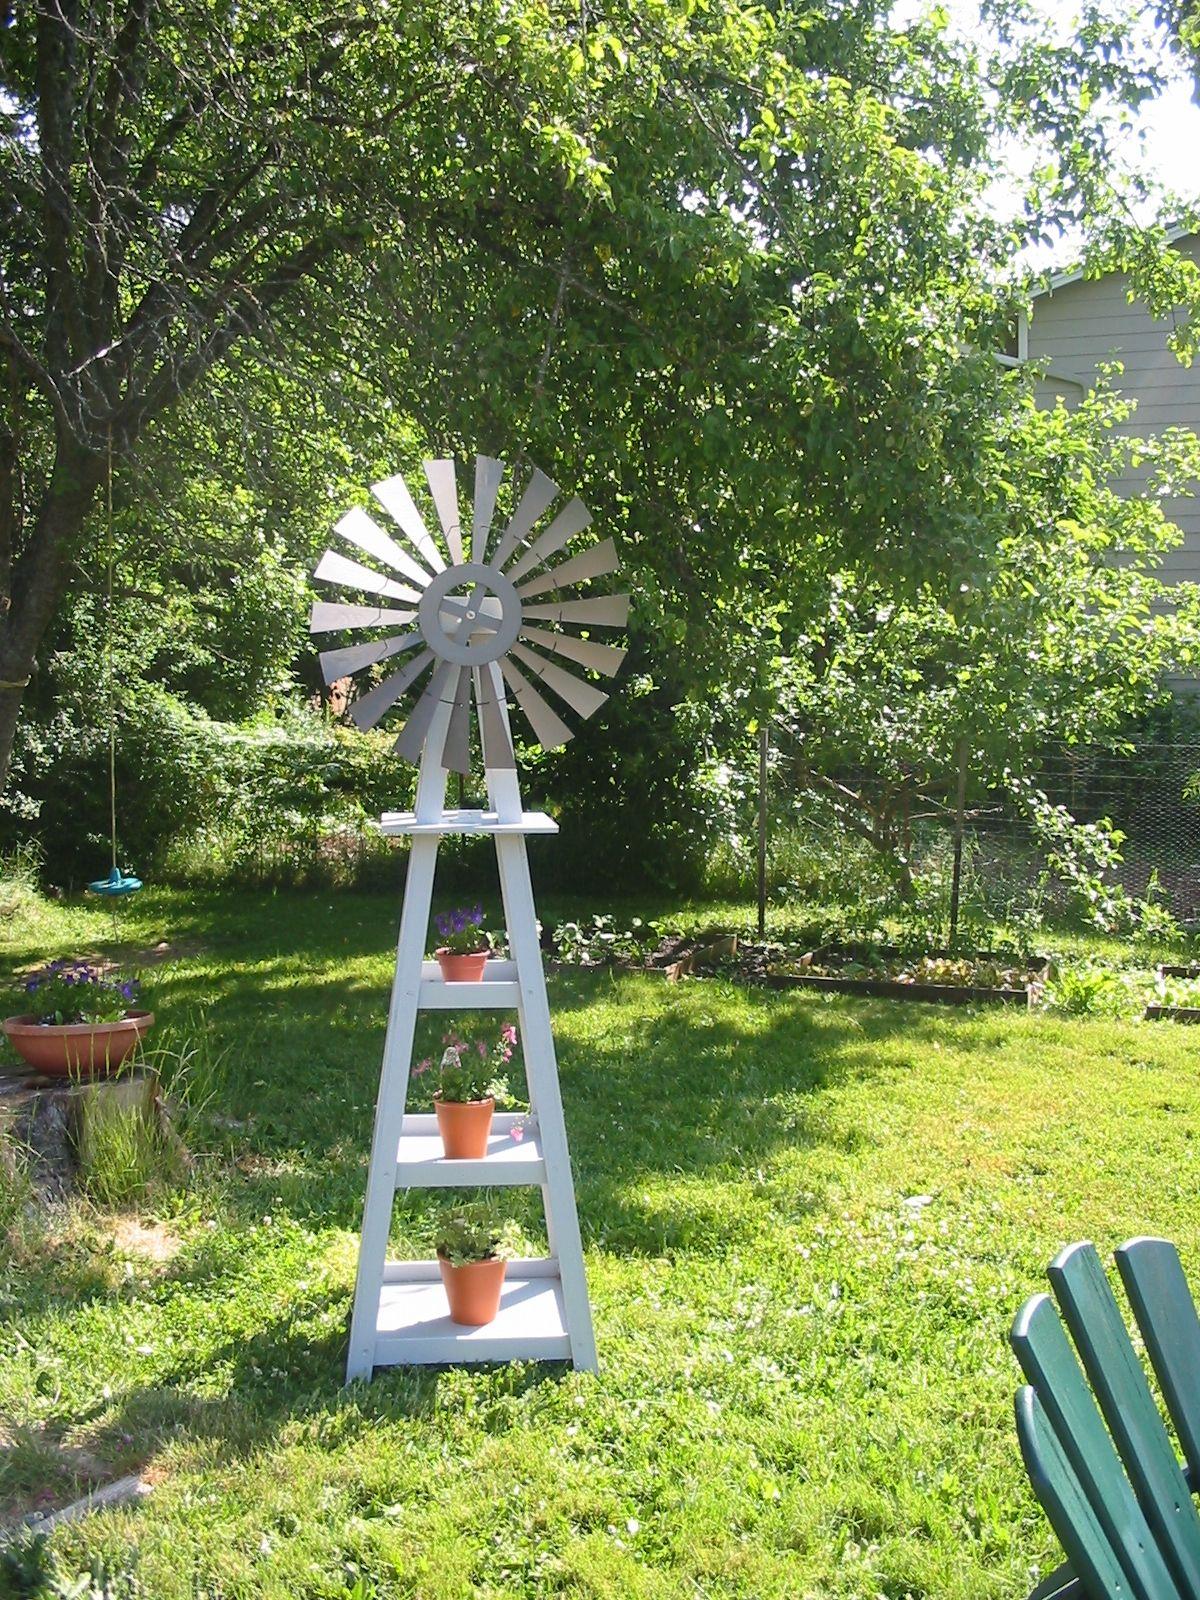 Garden windmill | Garden windmill, Windmill and Gardens